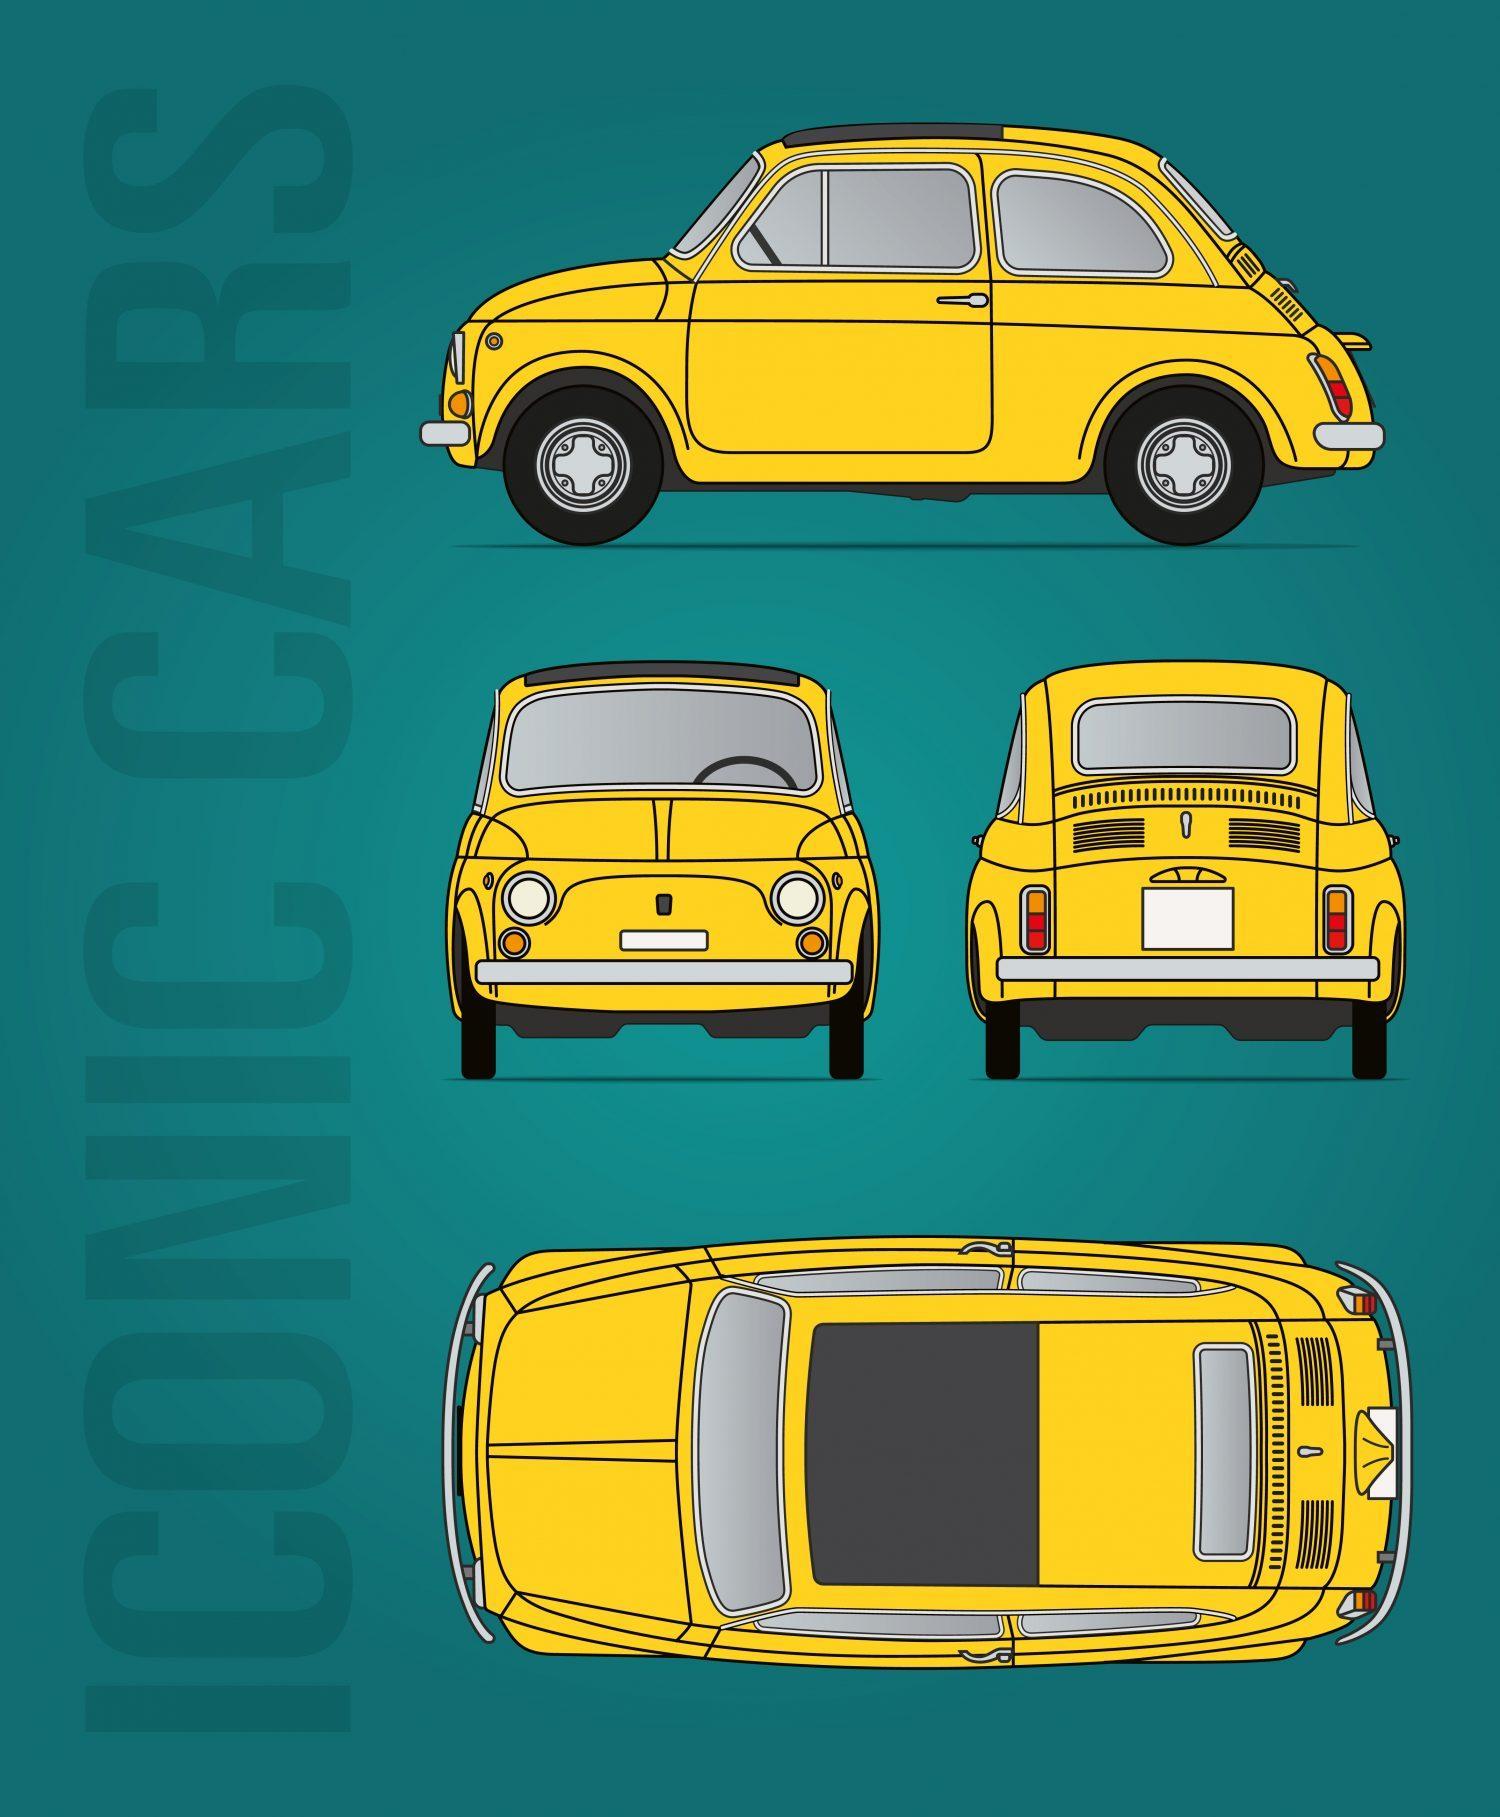 Vintage Garage  La Startup Che Trasforma L U0026 39 Auto D U0026 39 Epoca In